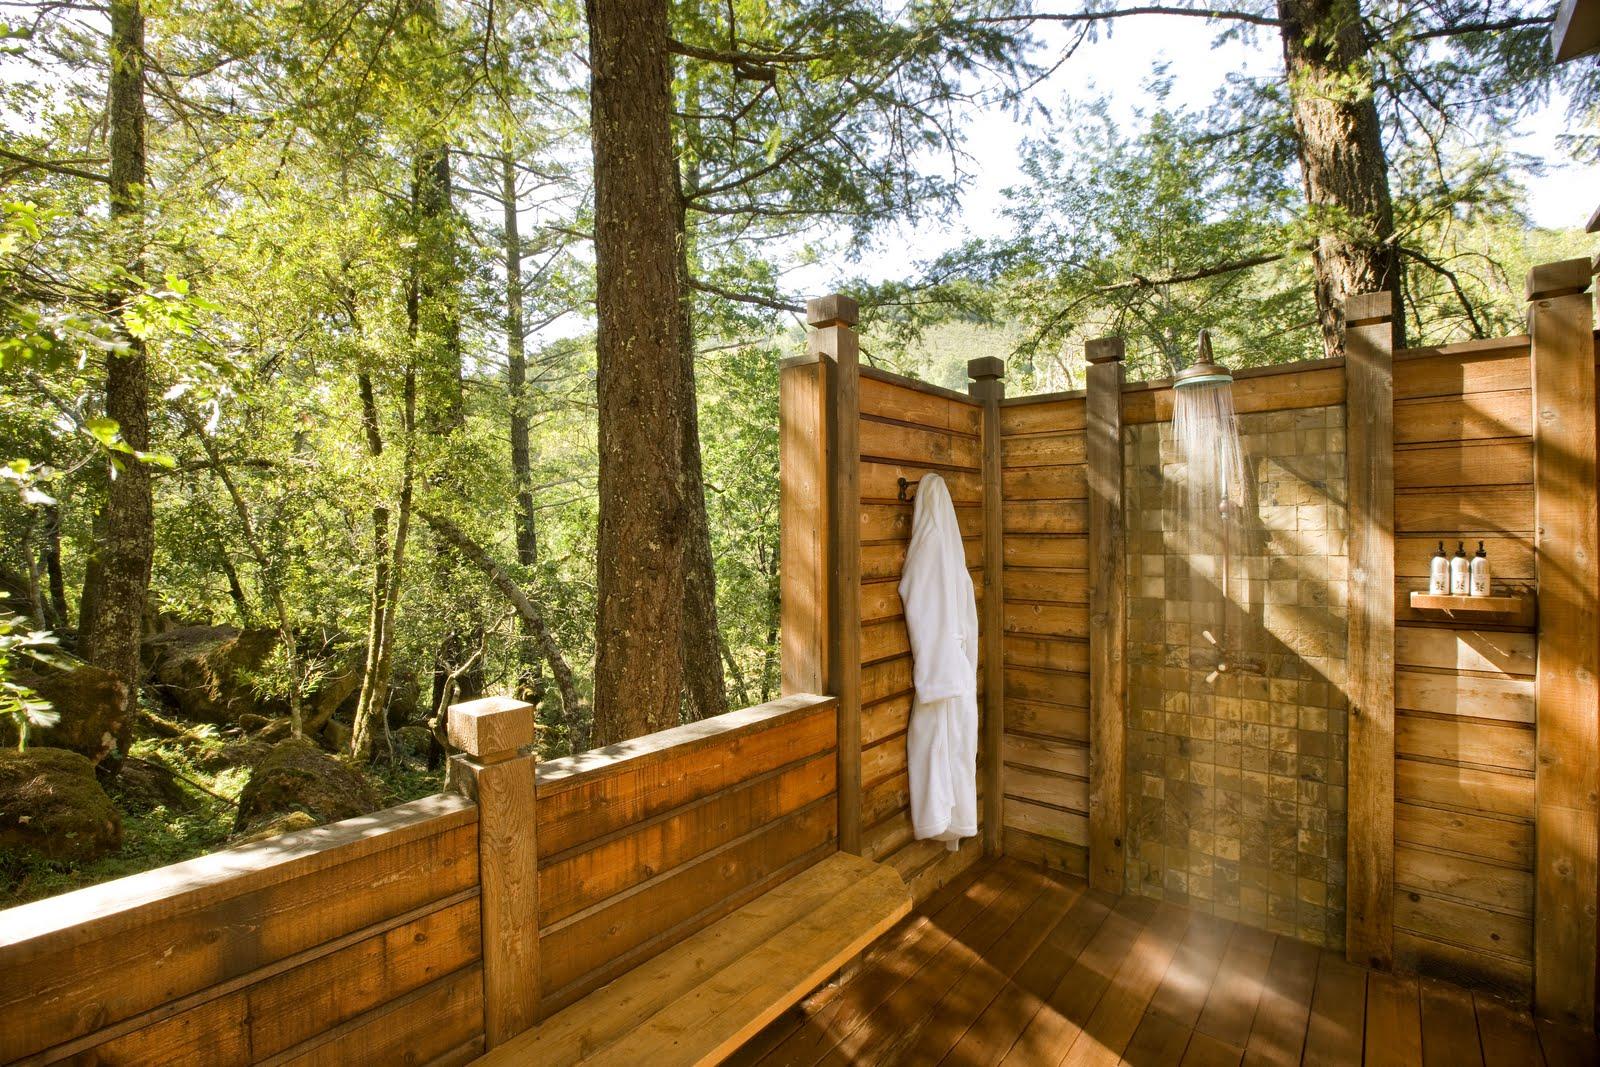 At Home: Killer Outdoor Bathrooms